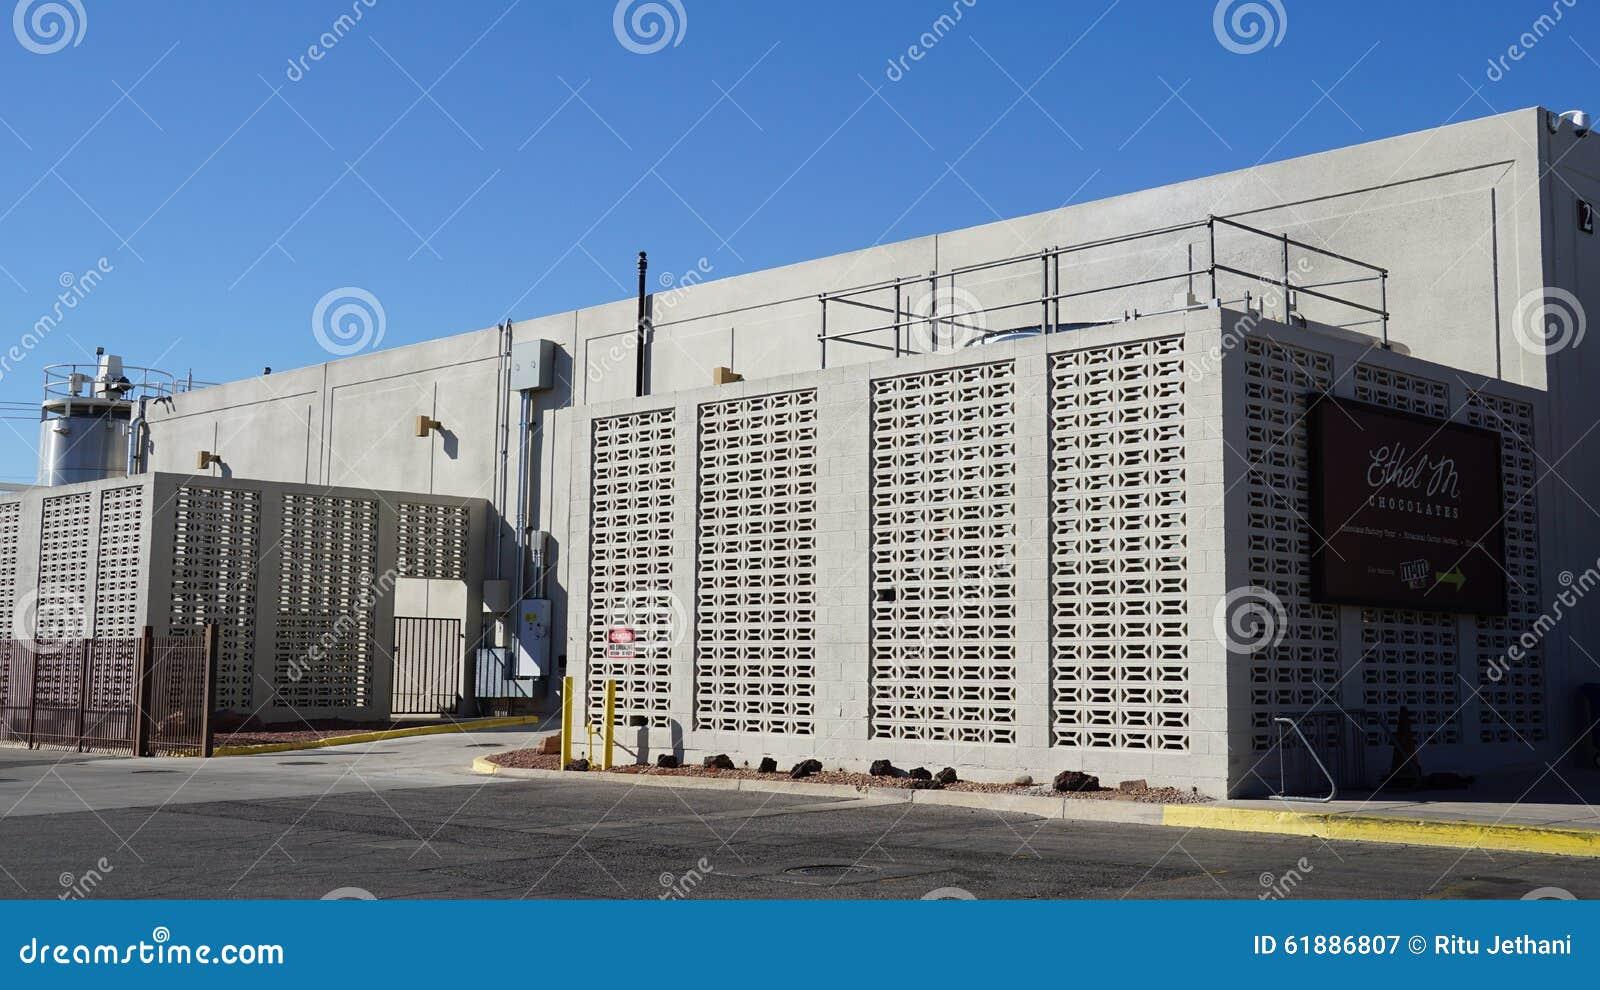 Ethel M Chocolate Factory Building Stock Photo - Image: 61886807